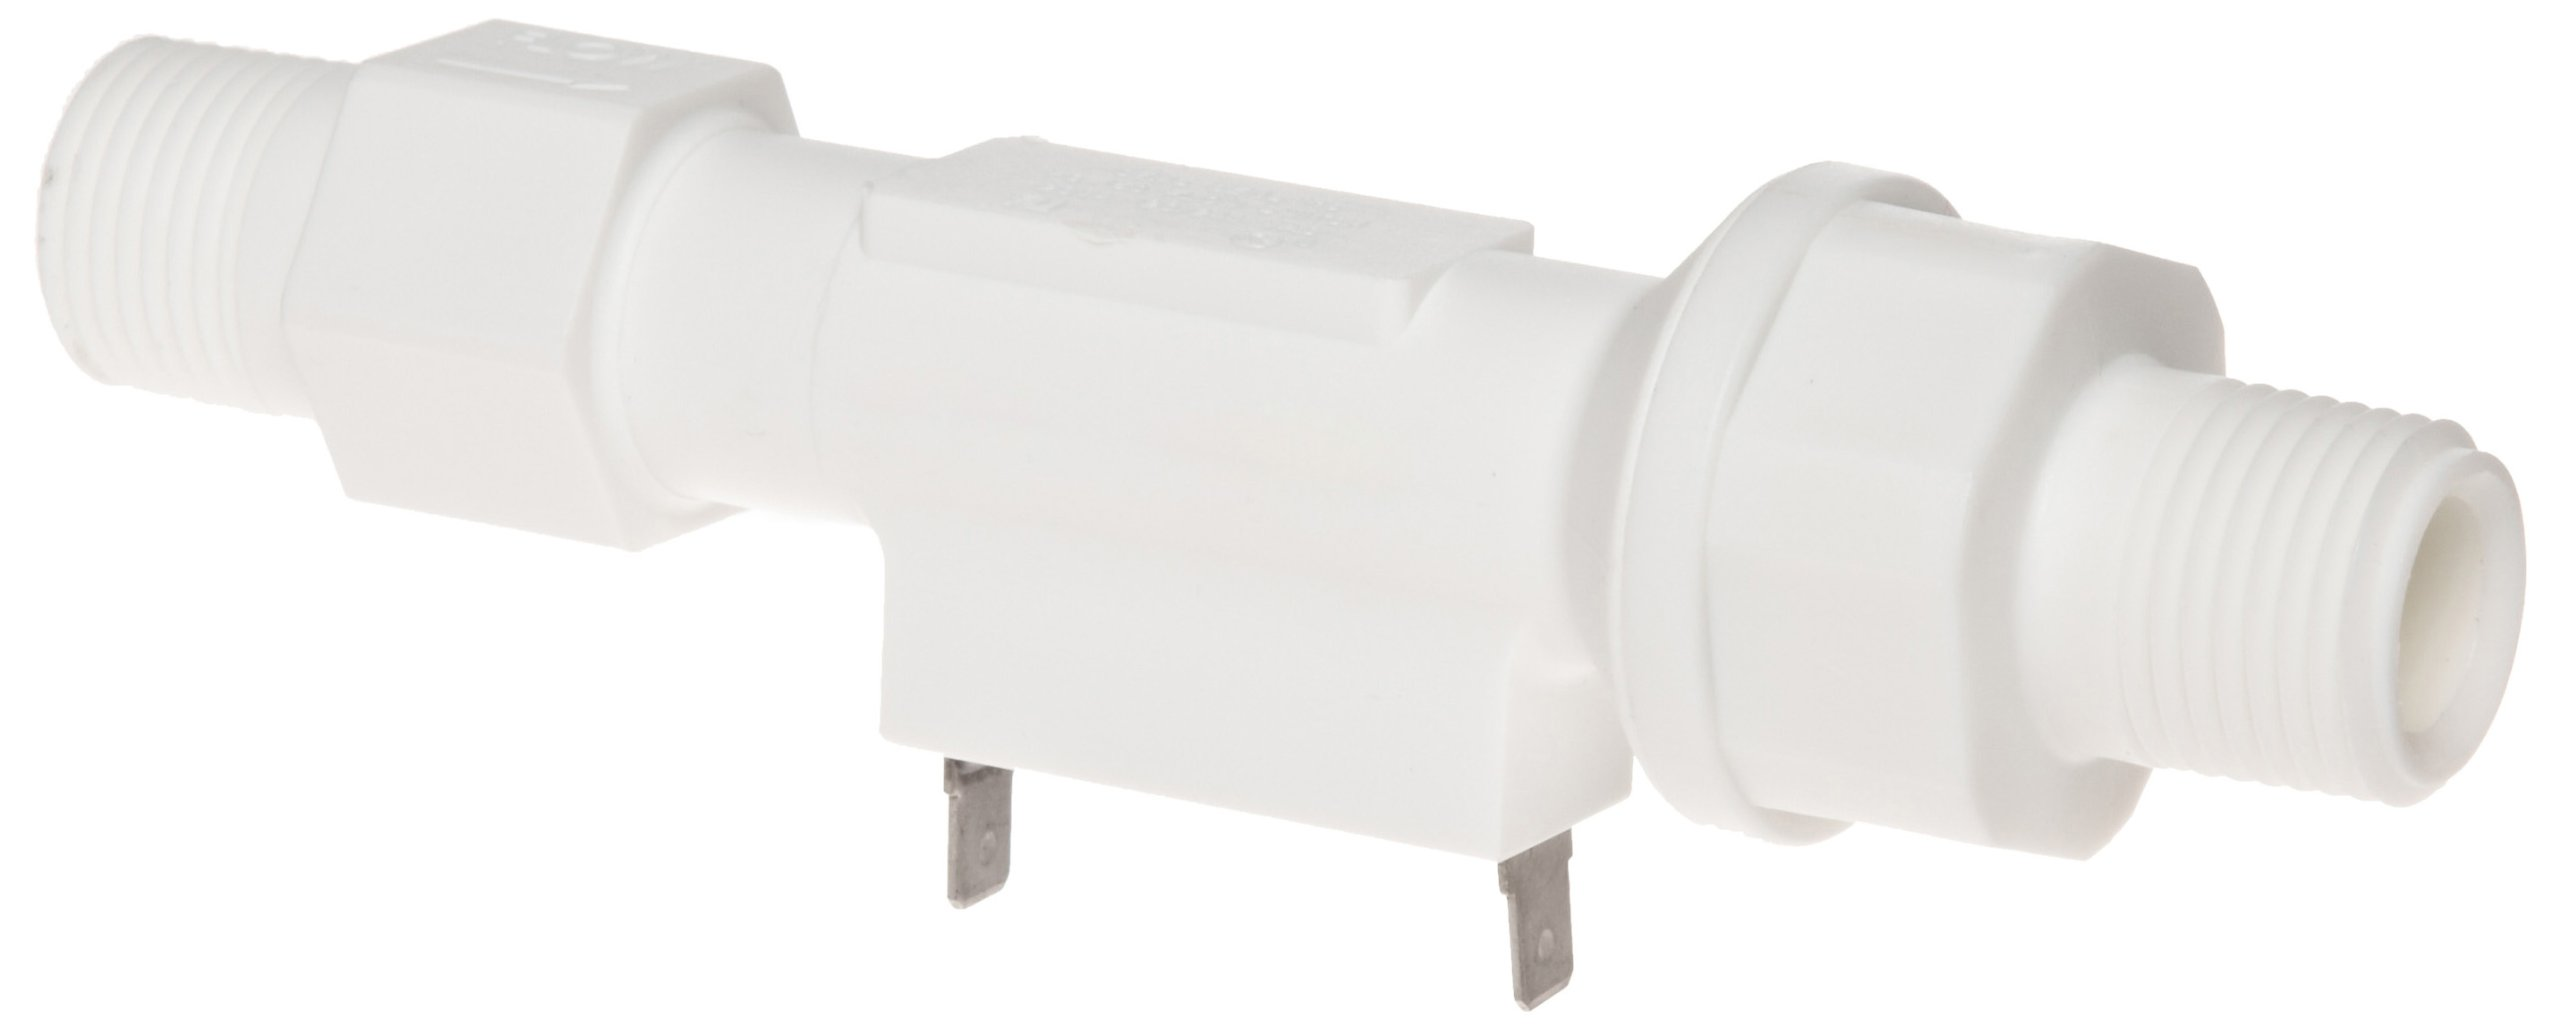 Gems Sensors FS-150 Series Polypropylene Flow Switch with Low Pressure Drop, Inline, Piston Type, Normally Open, 0.5 gpm Flow Setting, 1/2'' NPT Male